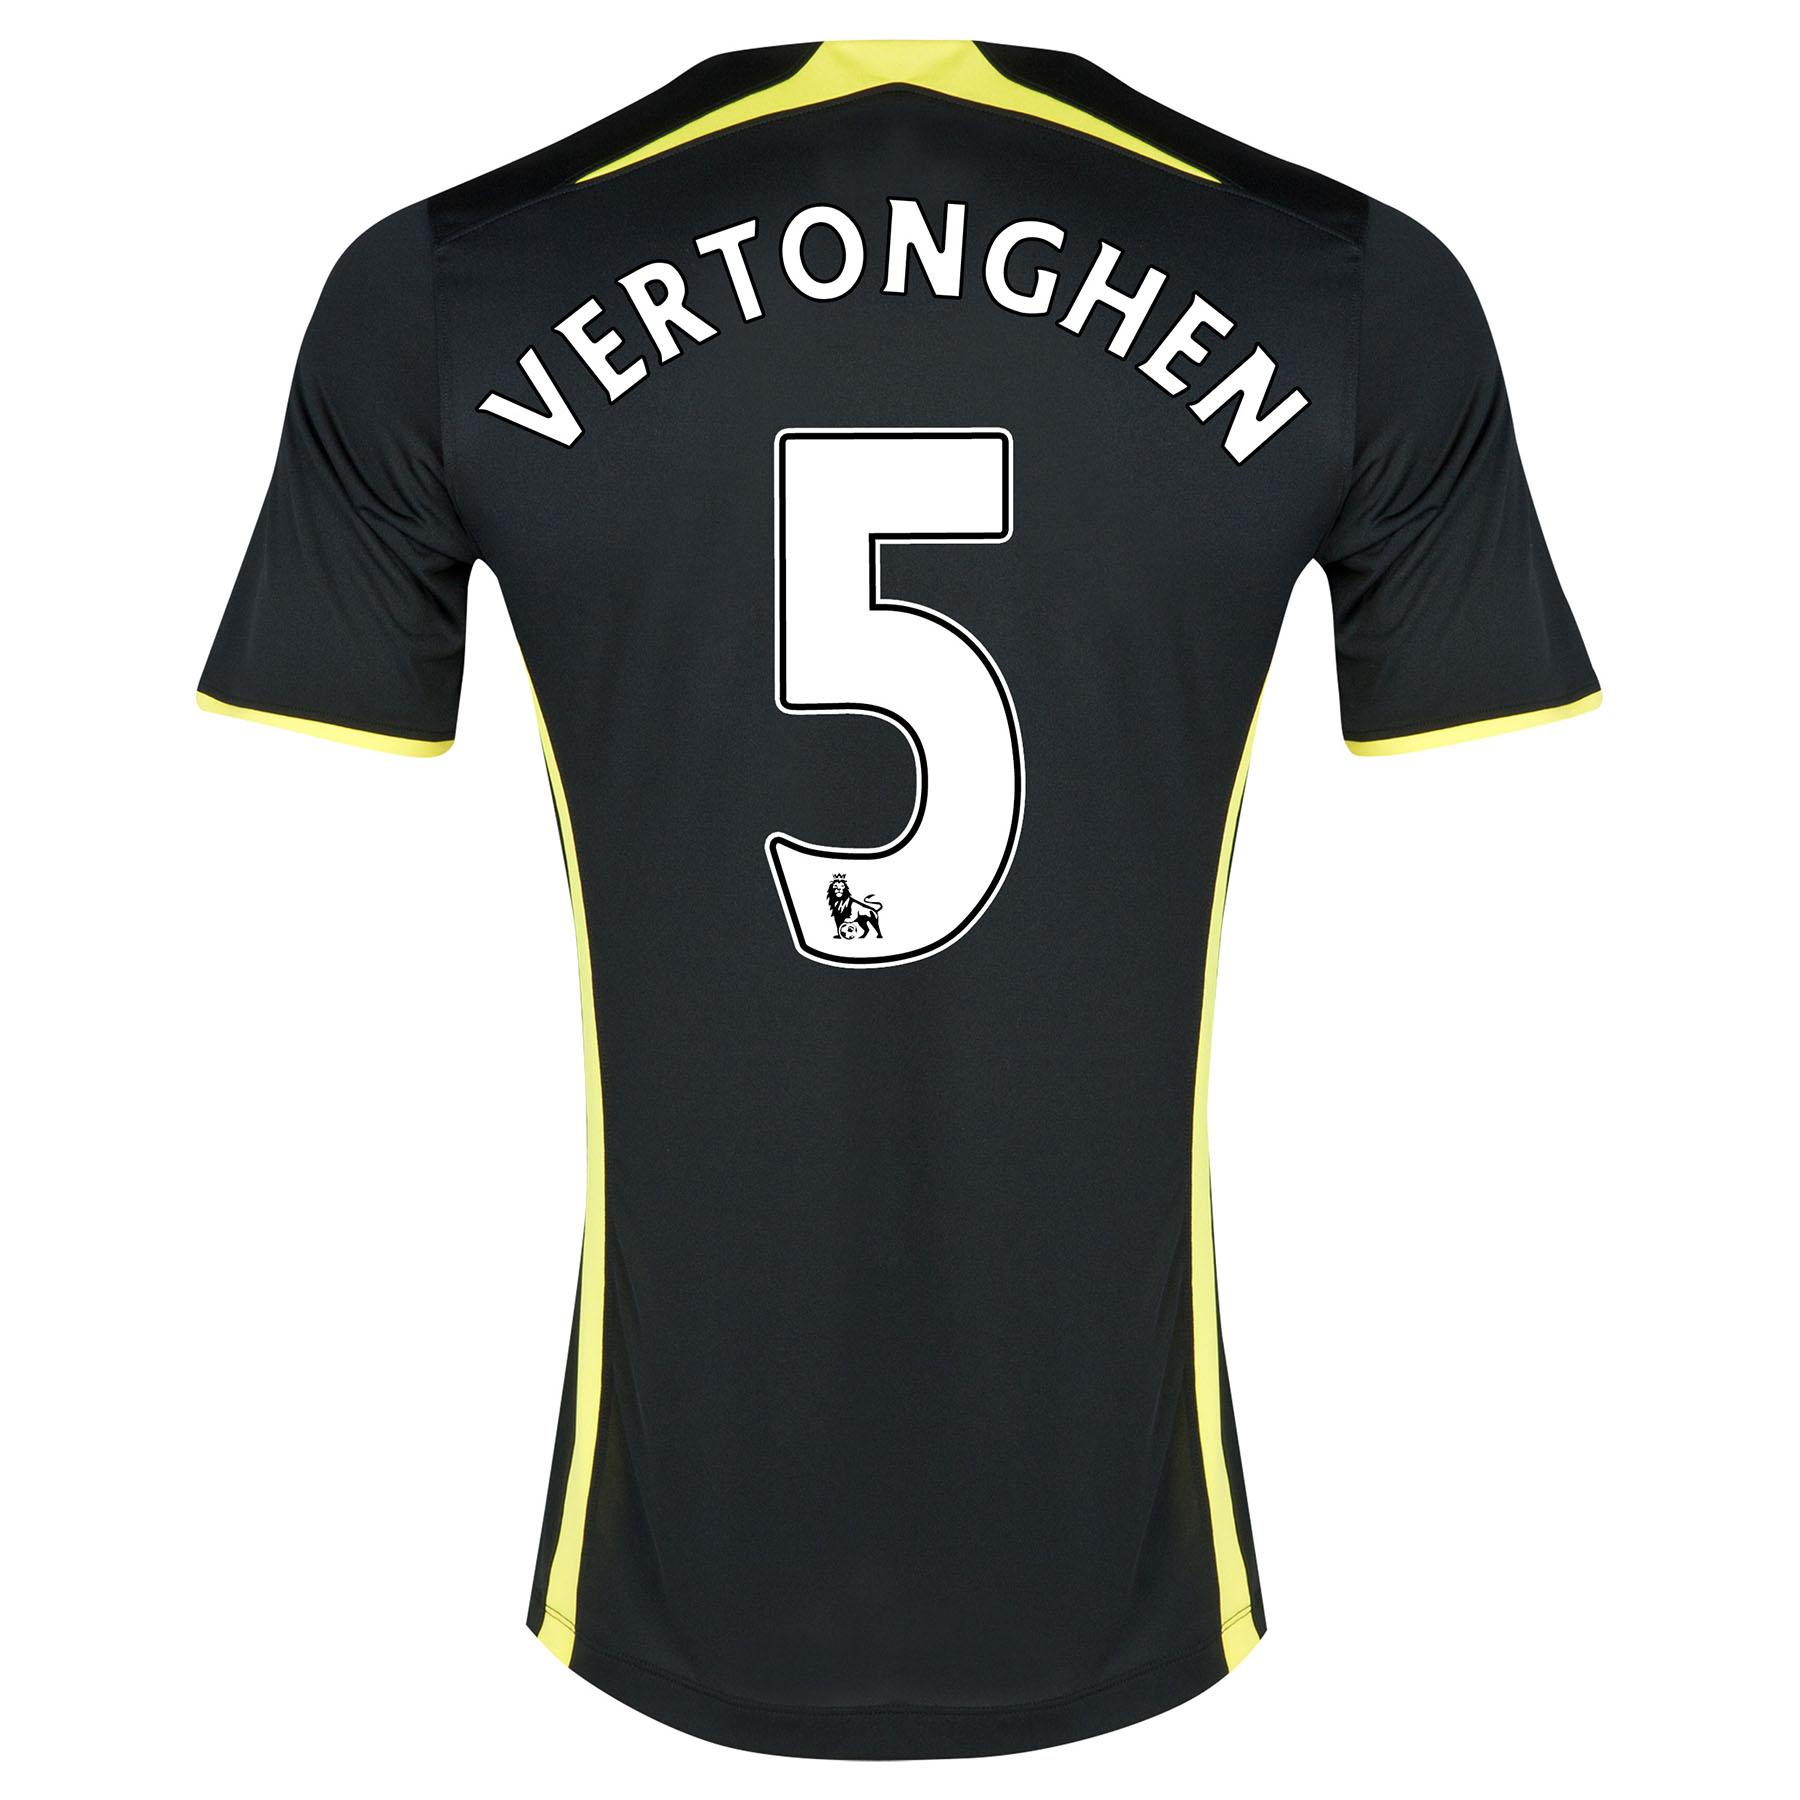 Tottenham Hotspur Away Shirt 2014/15 - Kids with Vertonghen 5 printing